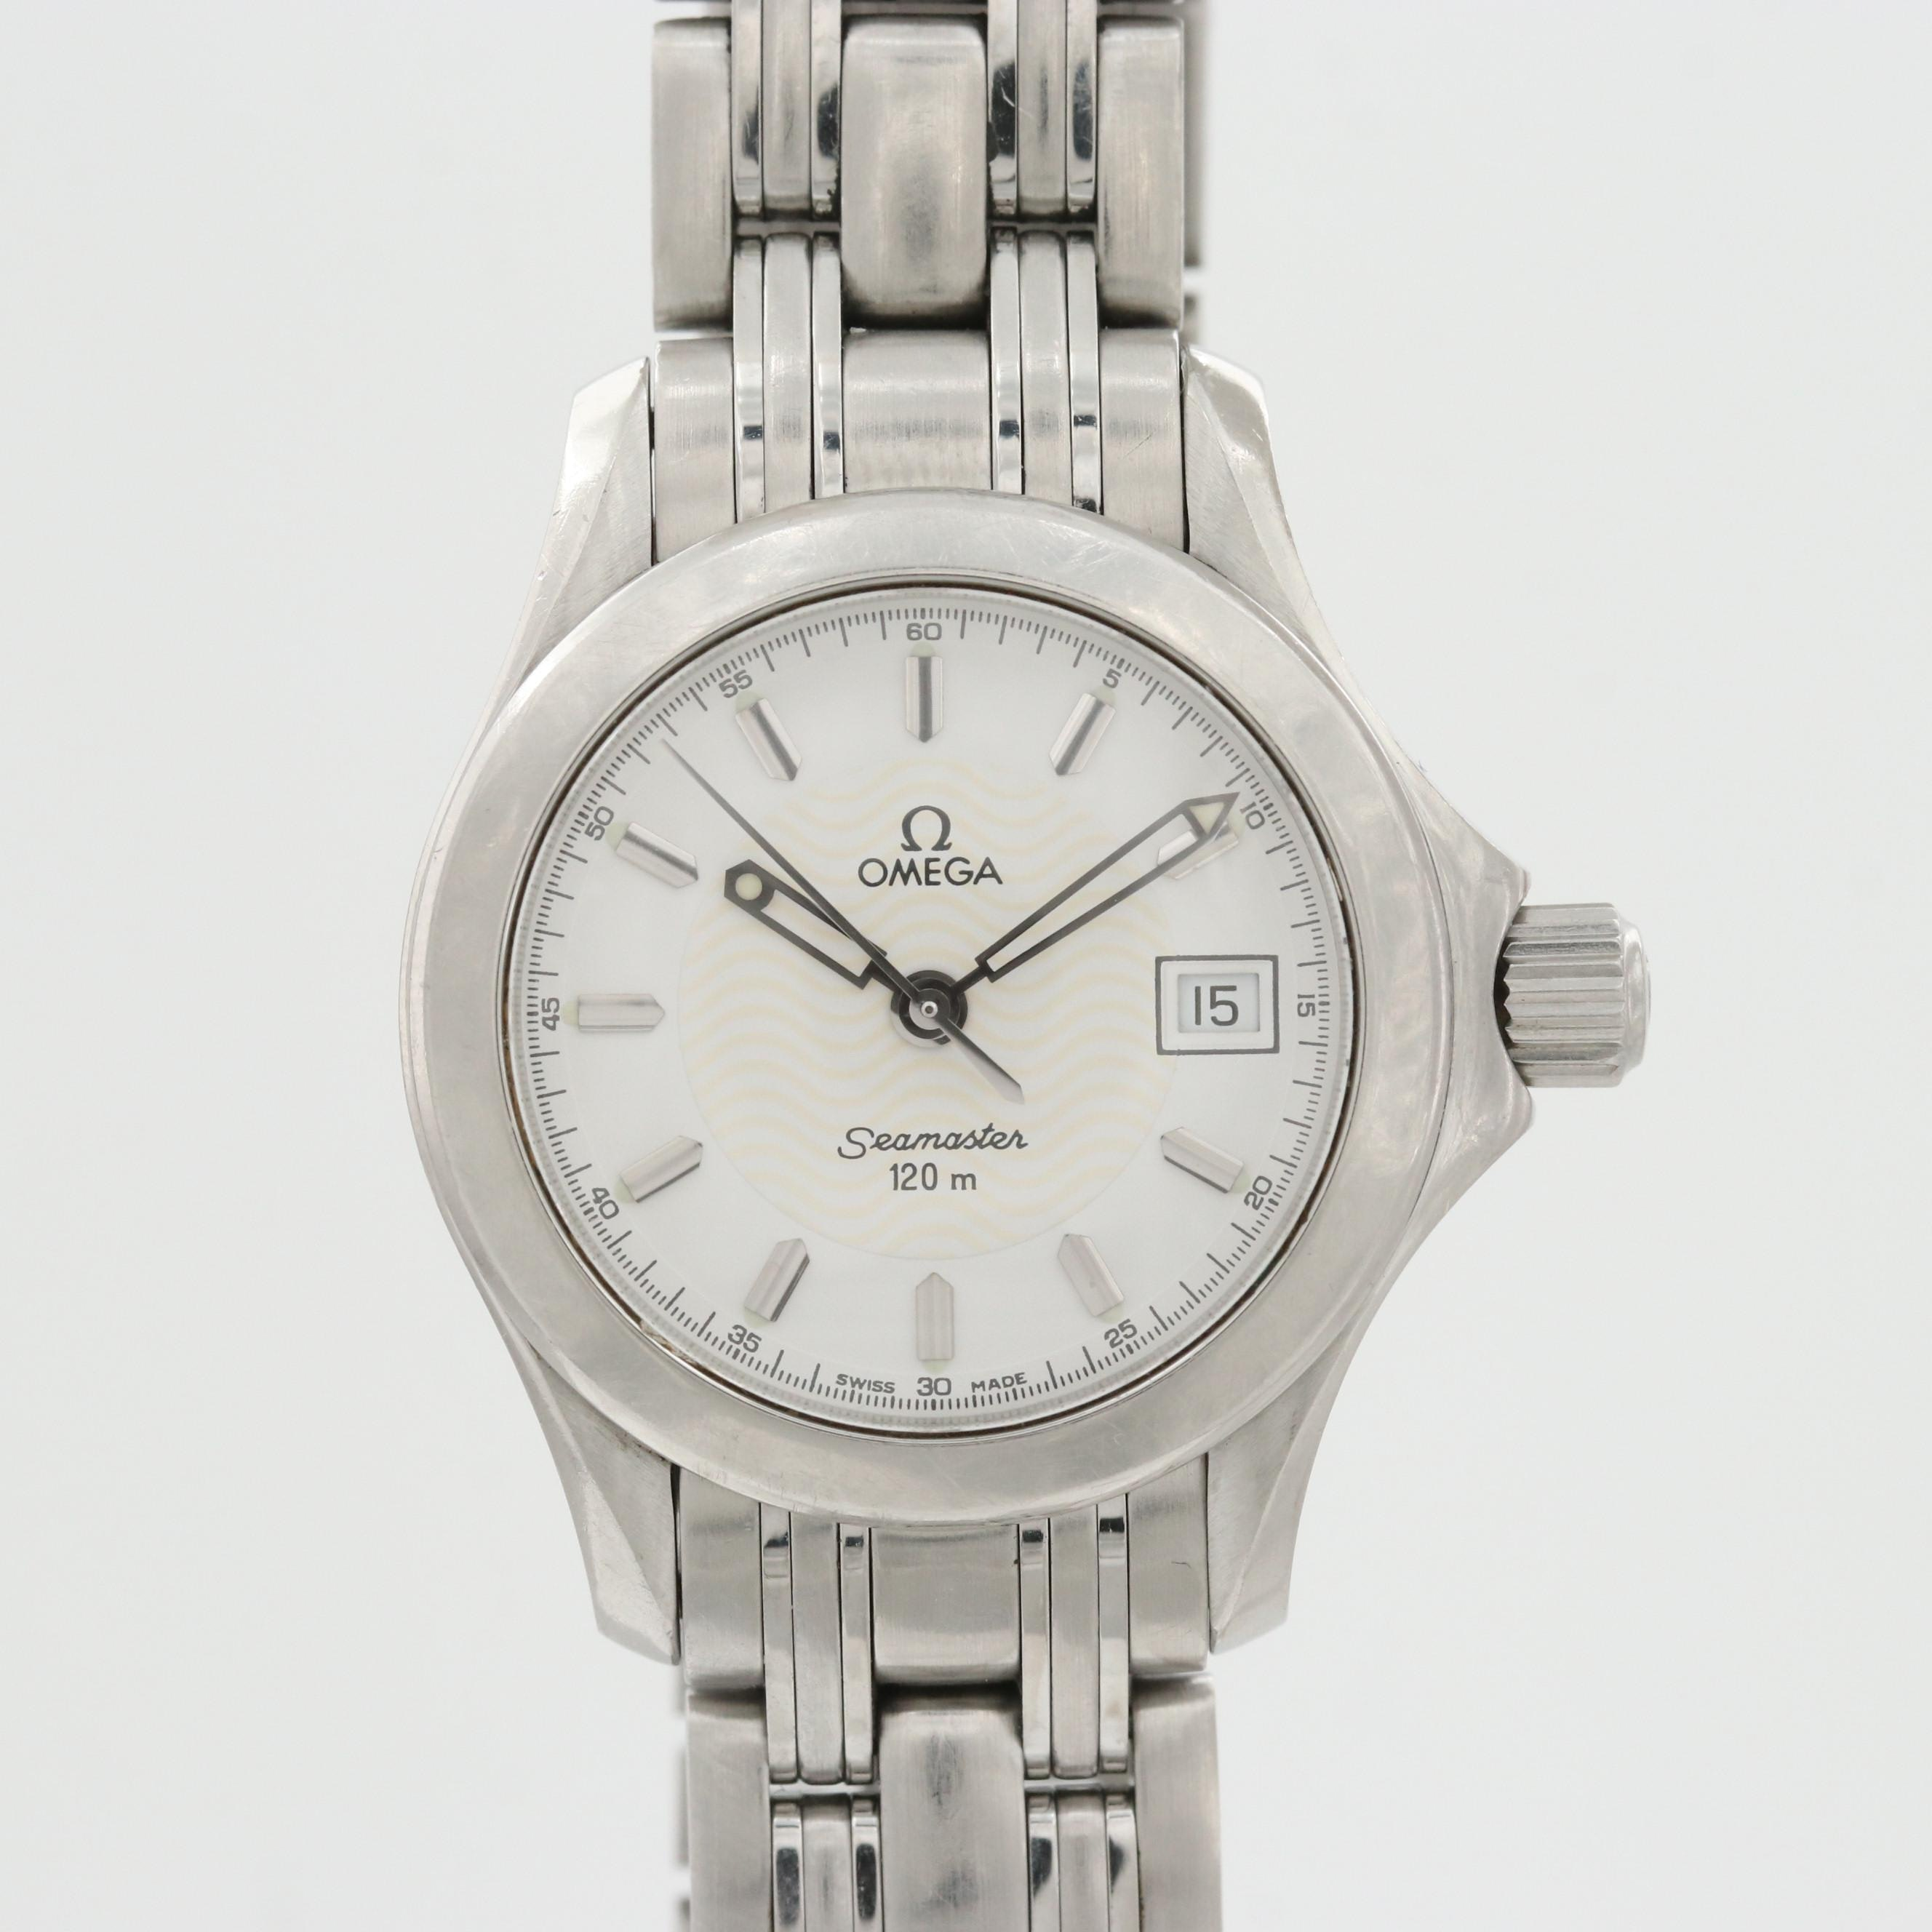 Omega Seamaster 120 Stainless Steel Quartz Wristwatch